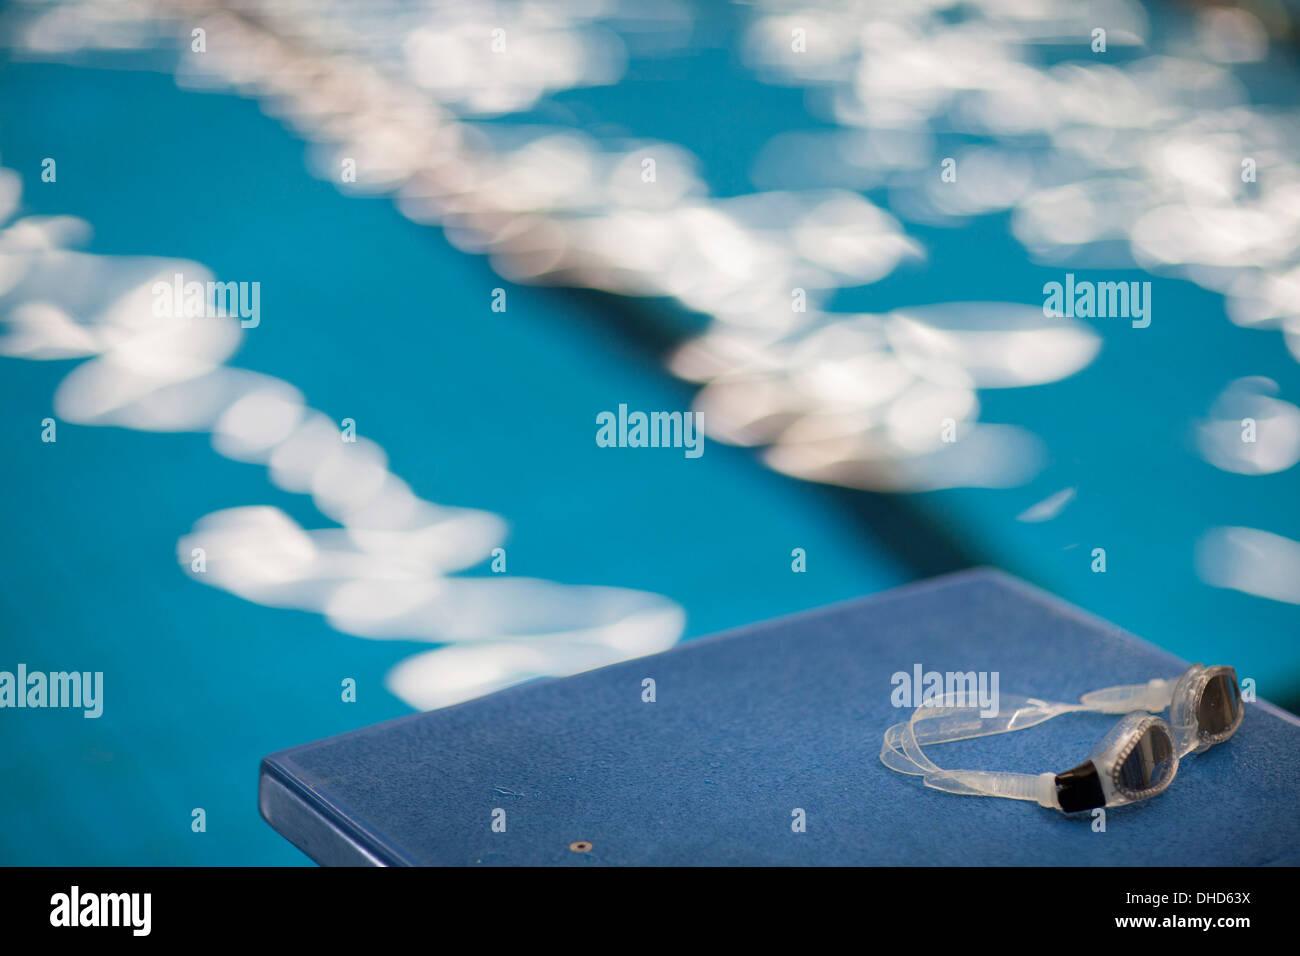 Schwimmbrille am Startblock Stockbild